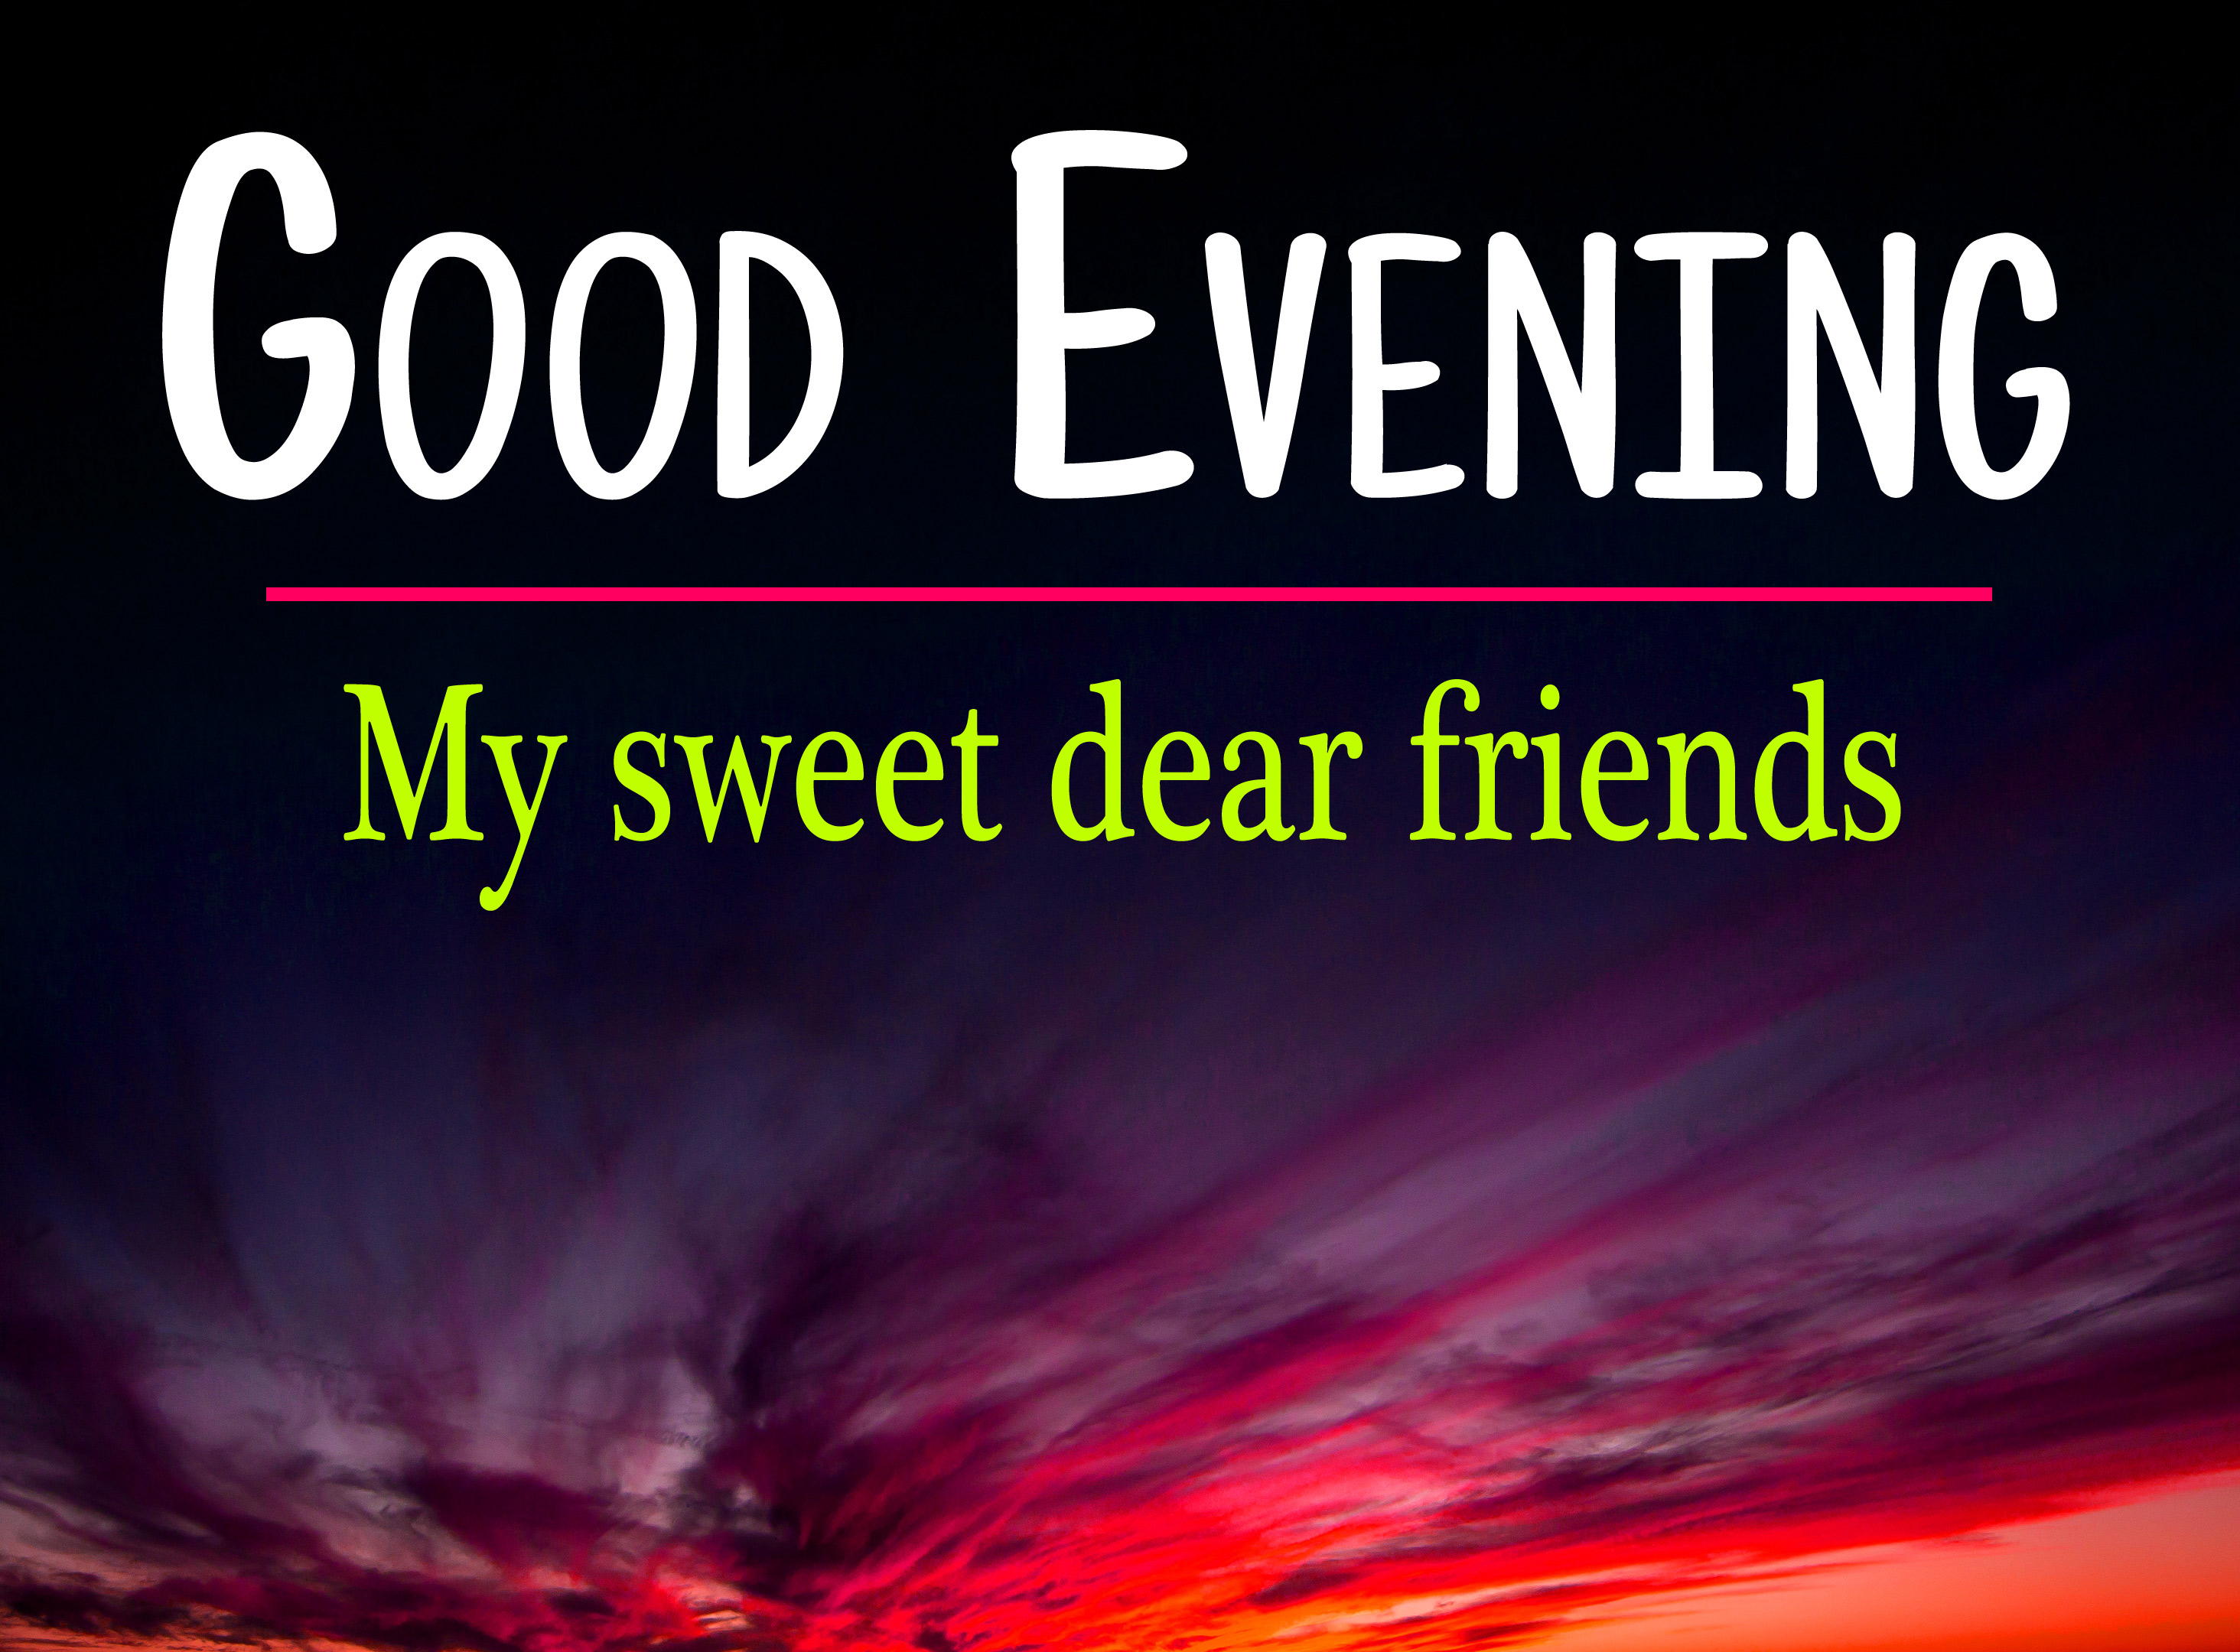 good evening photo 6